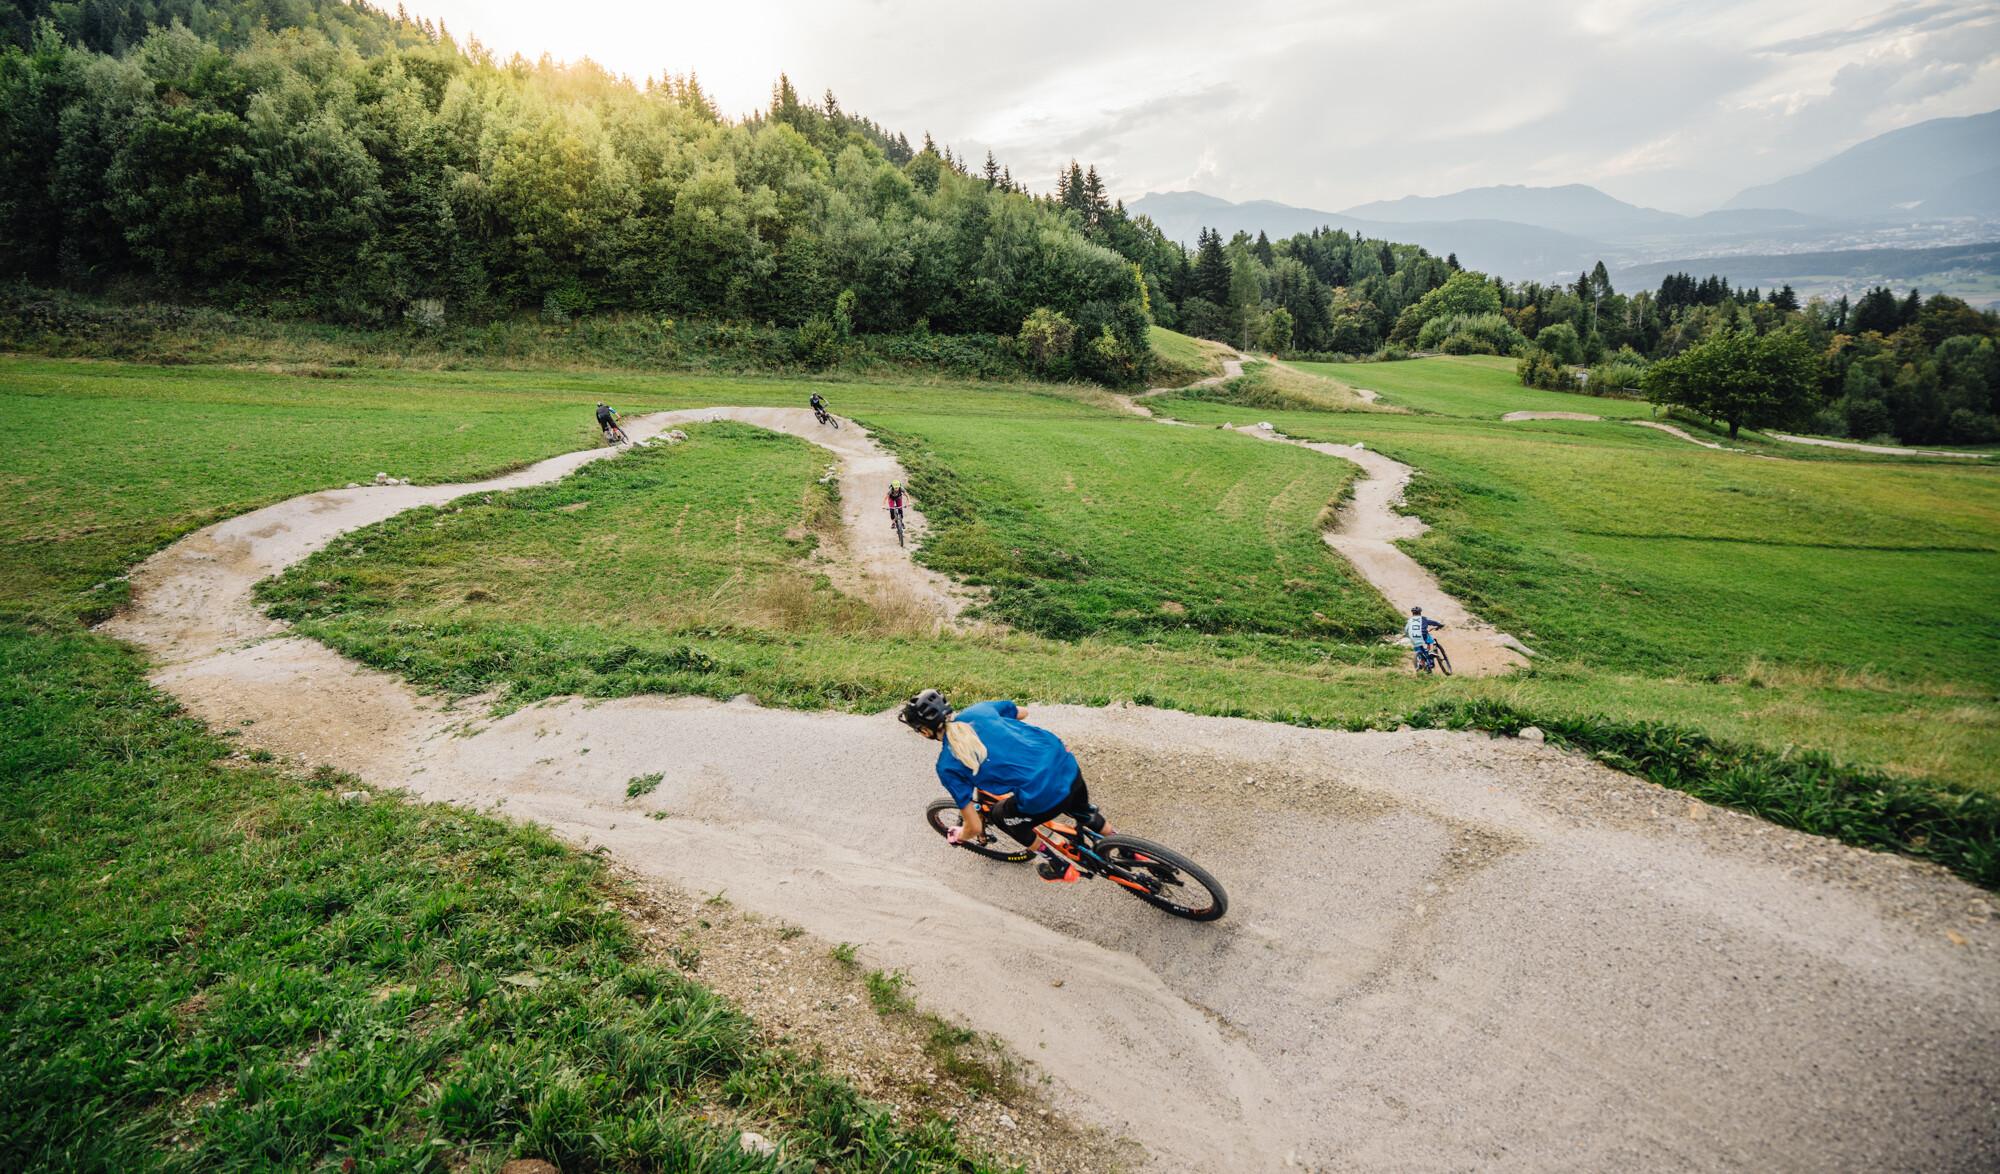 Downhill-Biker im Flowgartner Trail in Kärnten